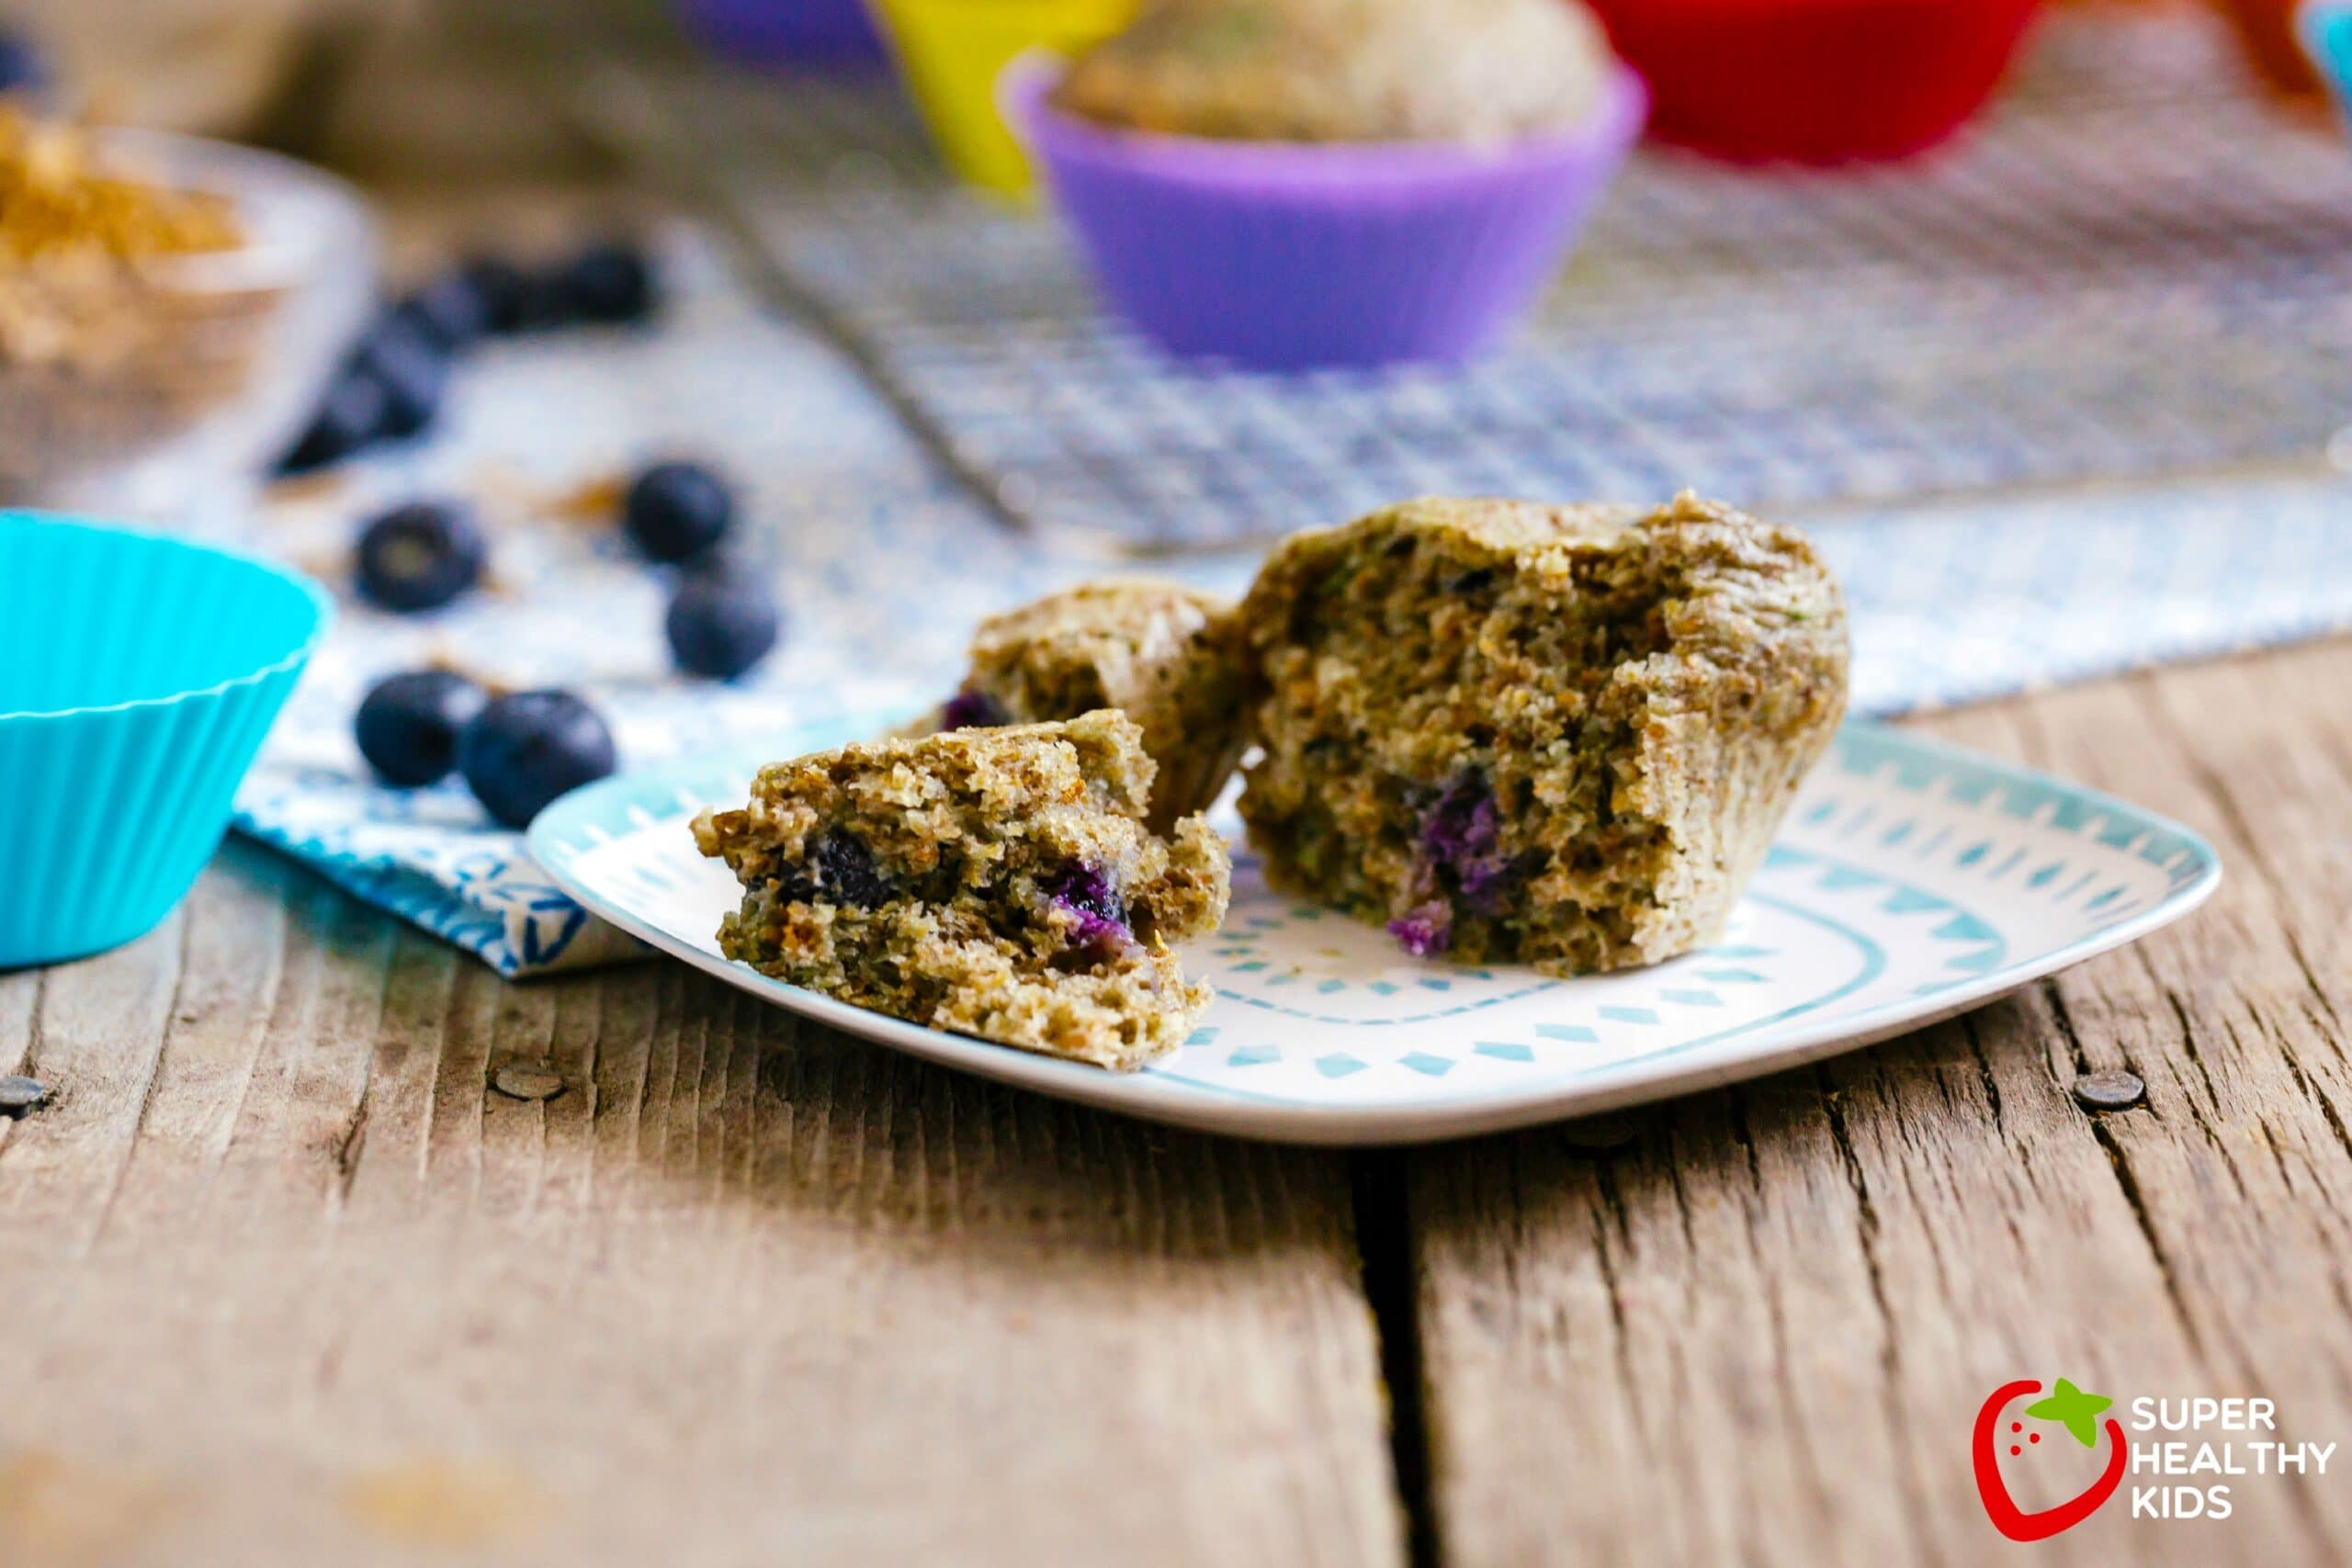 Blueberry Bran Muffin Recipe Super Healthy Kids